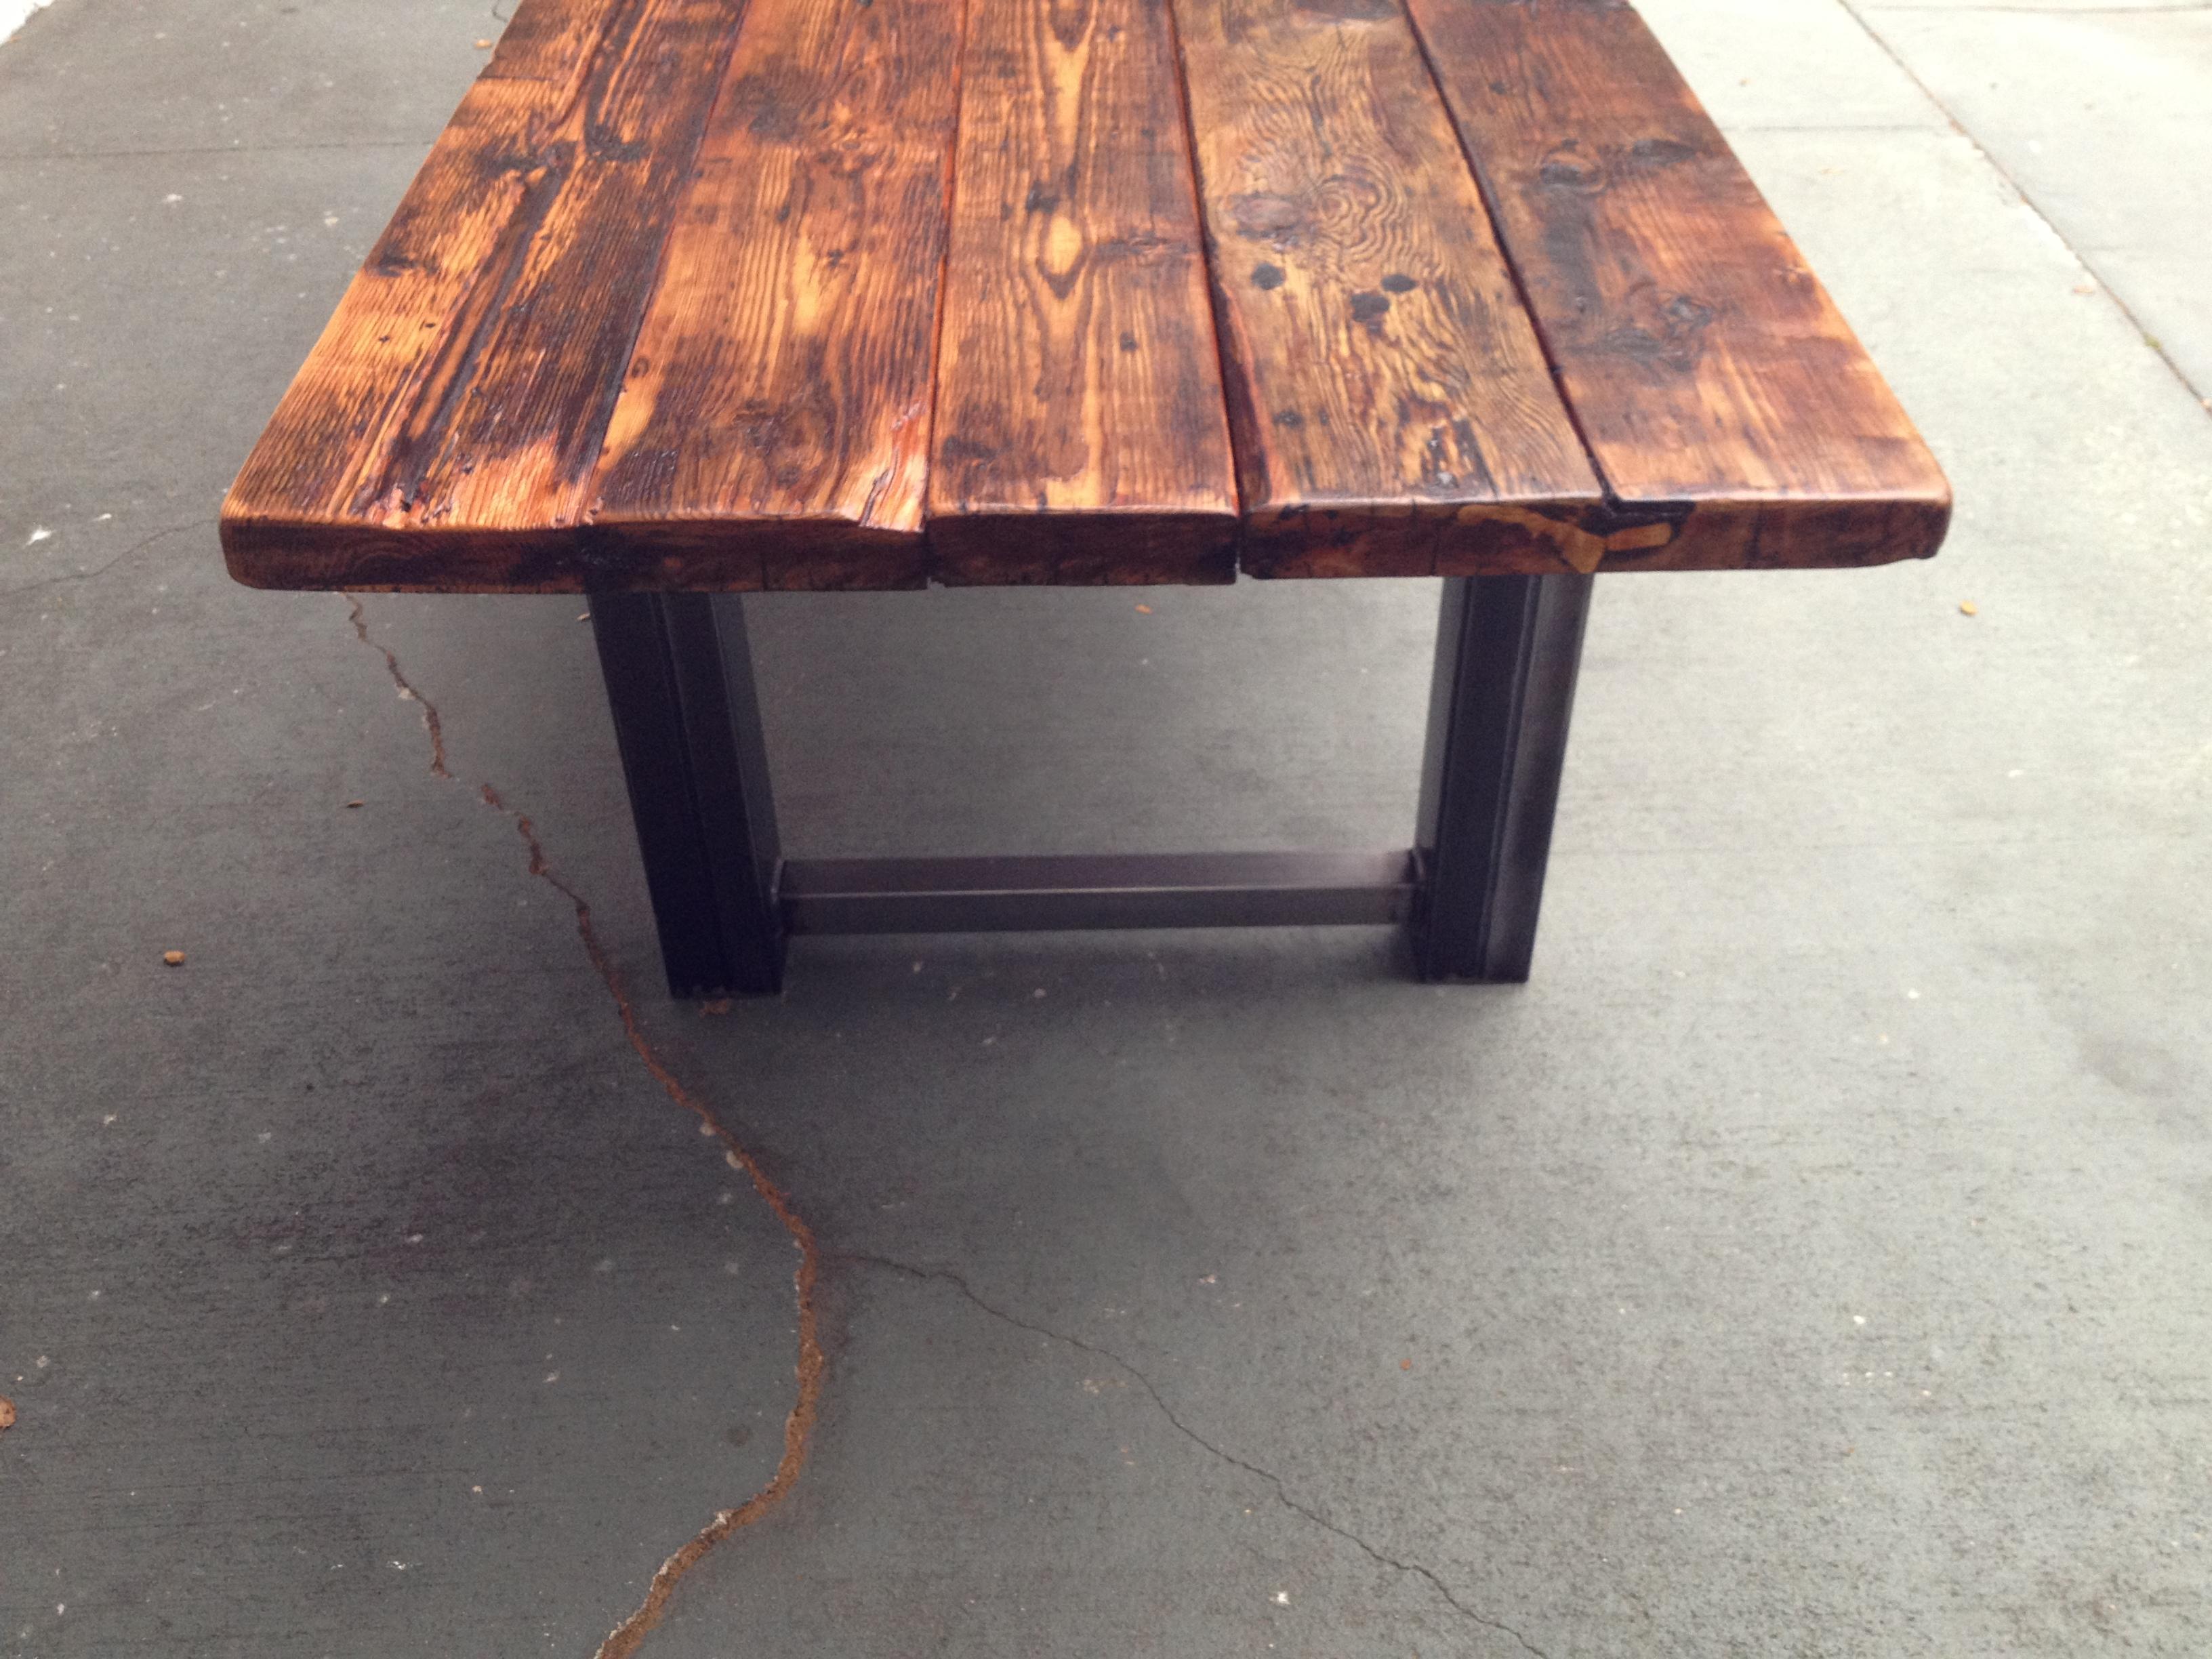 Sofa Table Wood And Glass Plans DIY How To Make